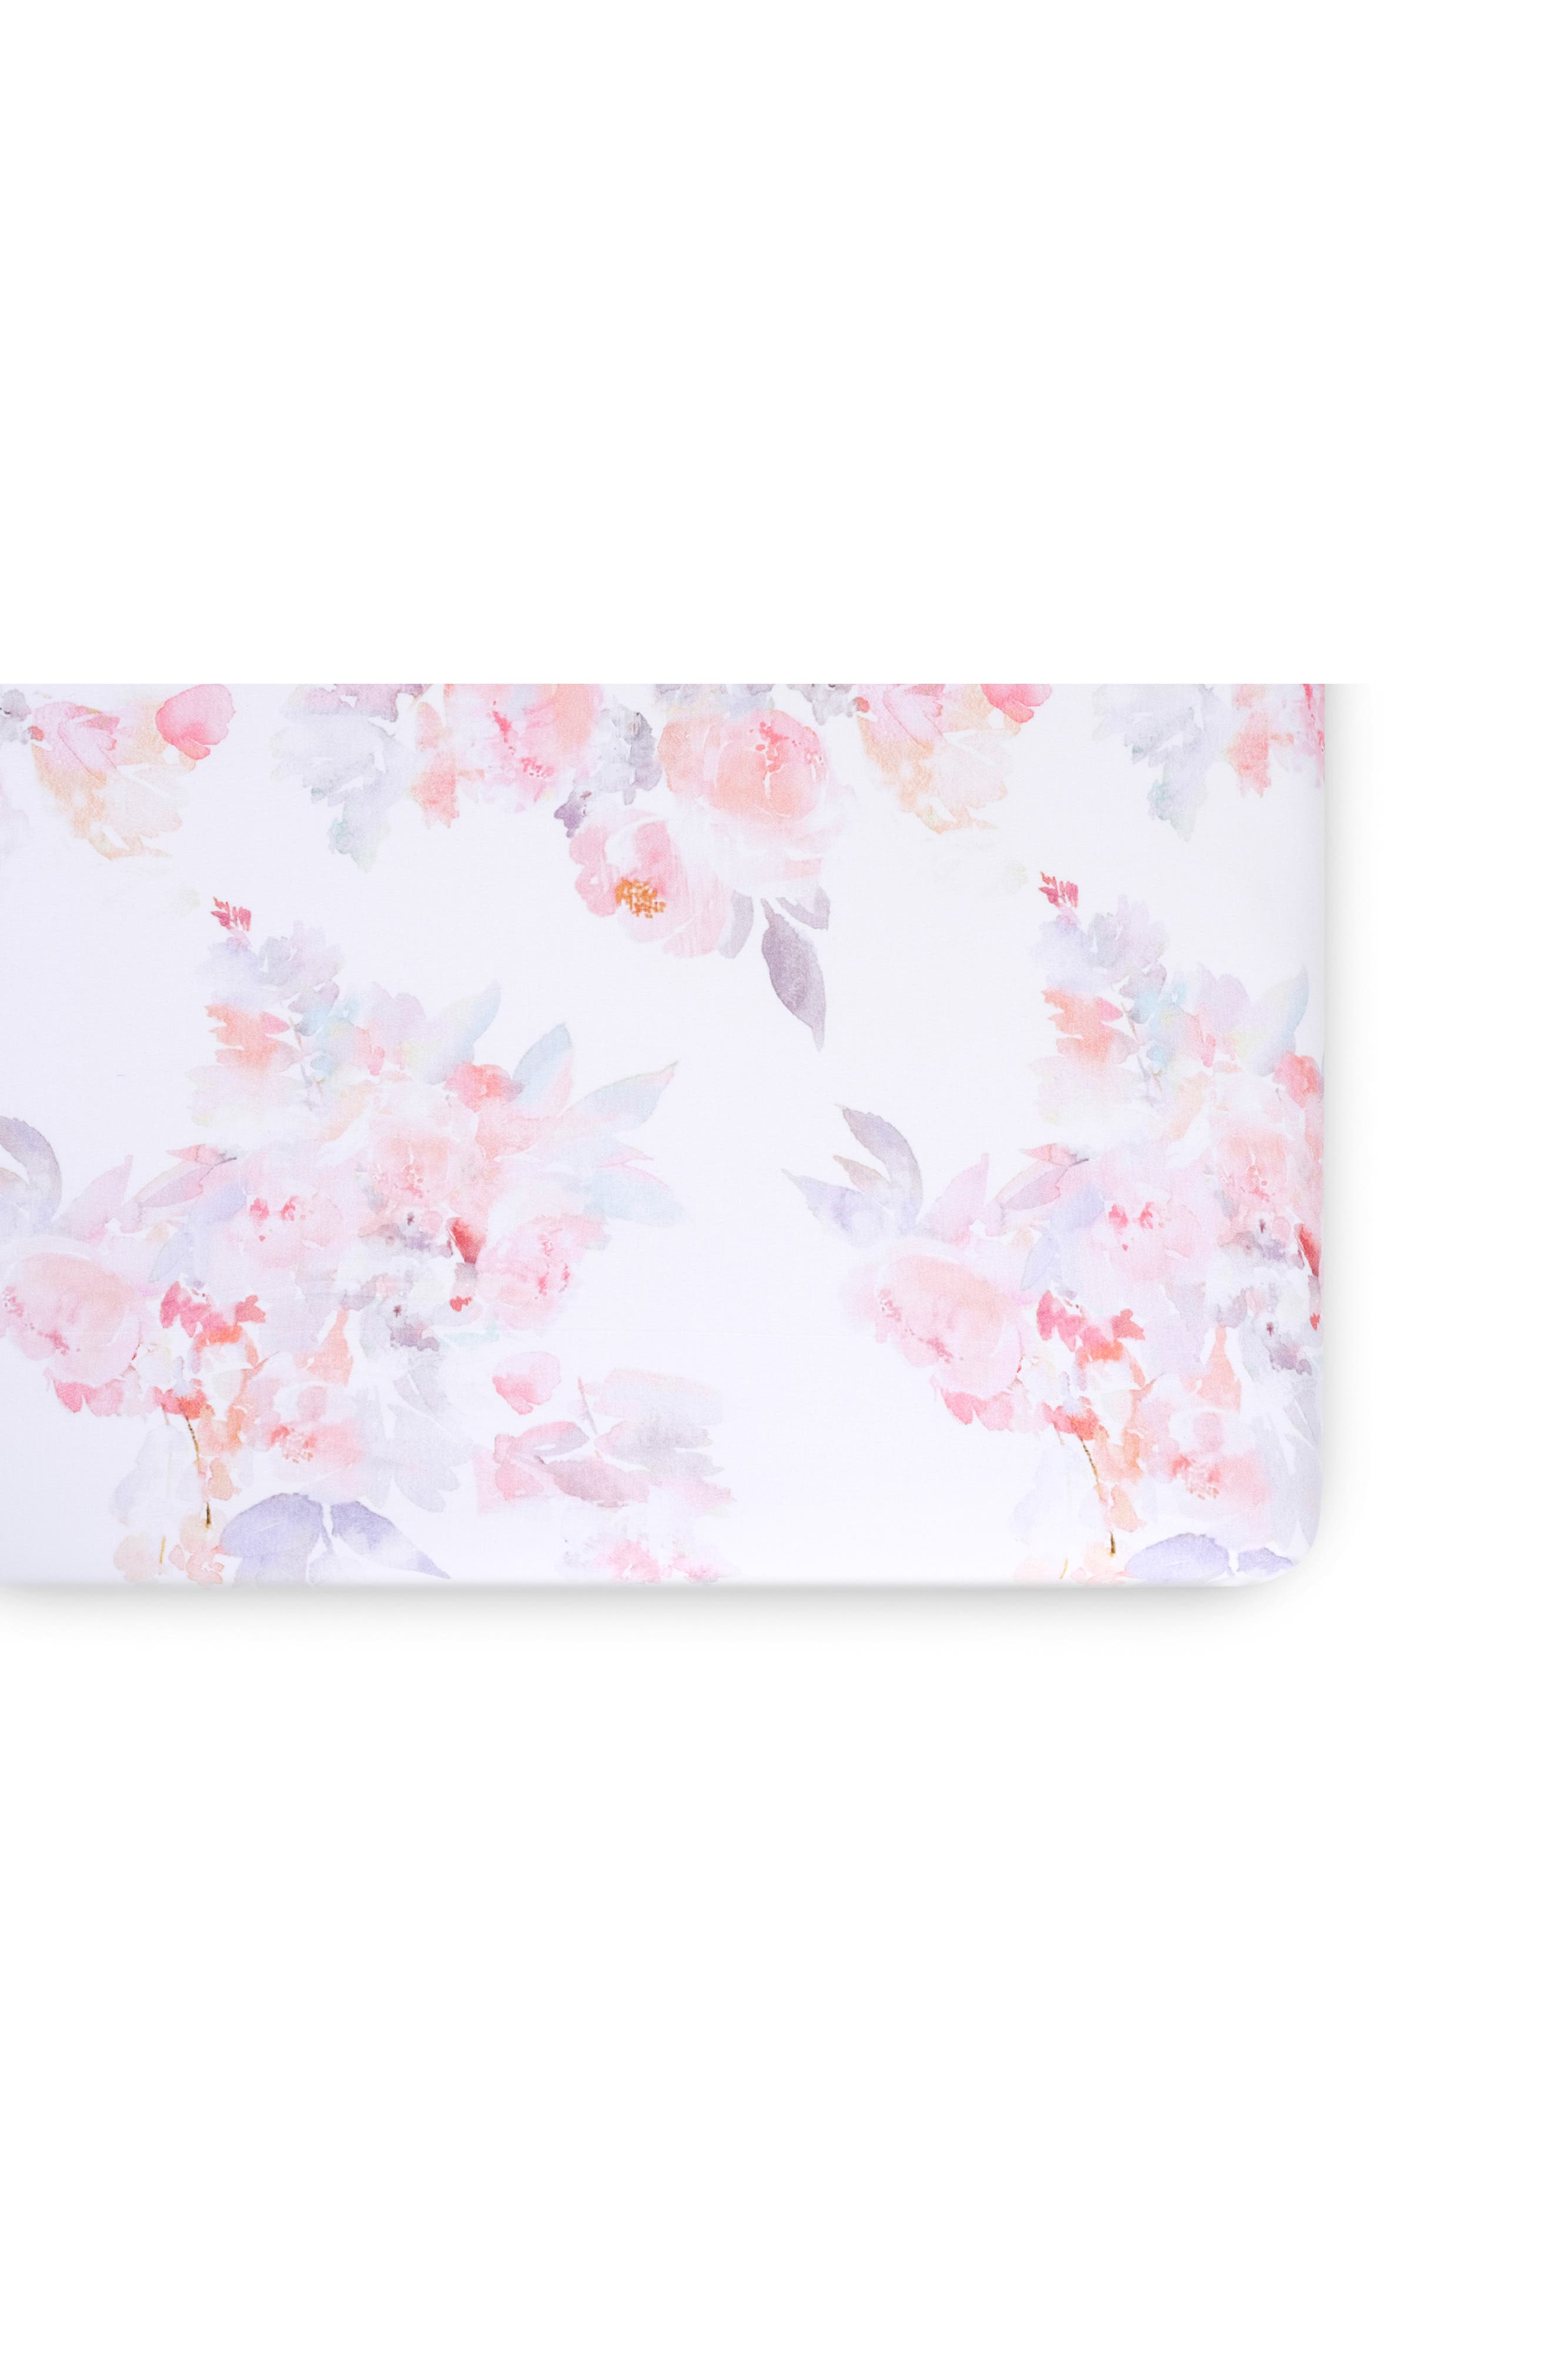 OILO, Prim Cuddle Blanket, Crib Skirt & Crib Sheet Set, Alternate thumbnail 3, color, PRIM